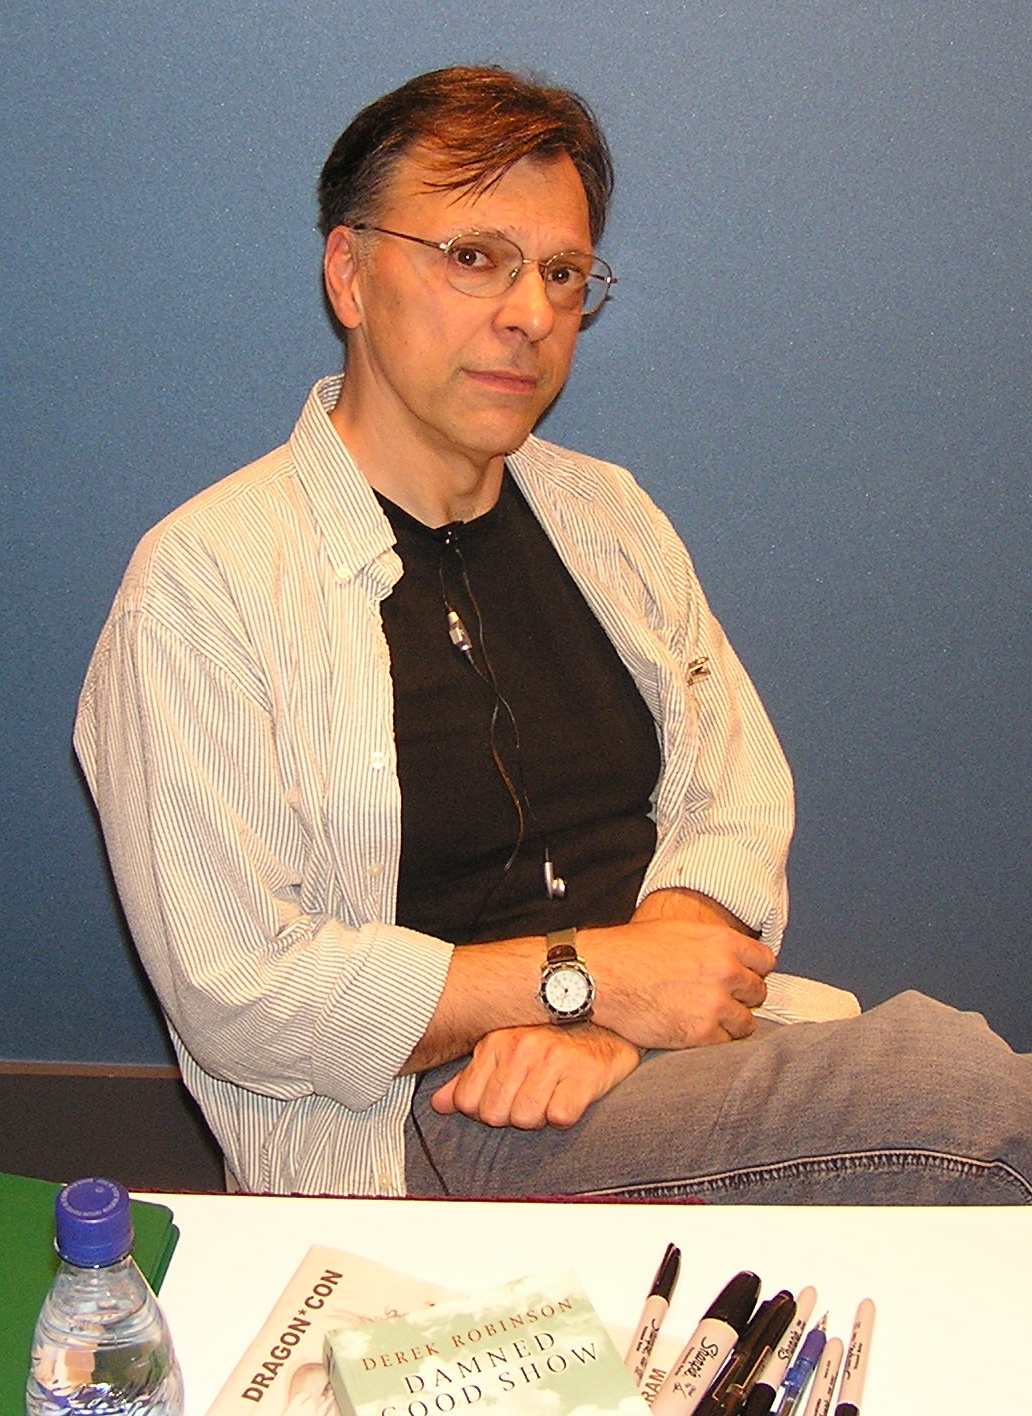 Howard Chaykin Net Worth